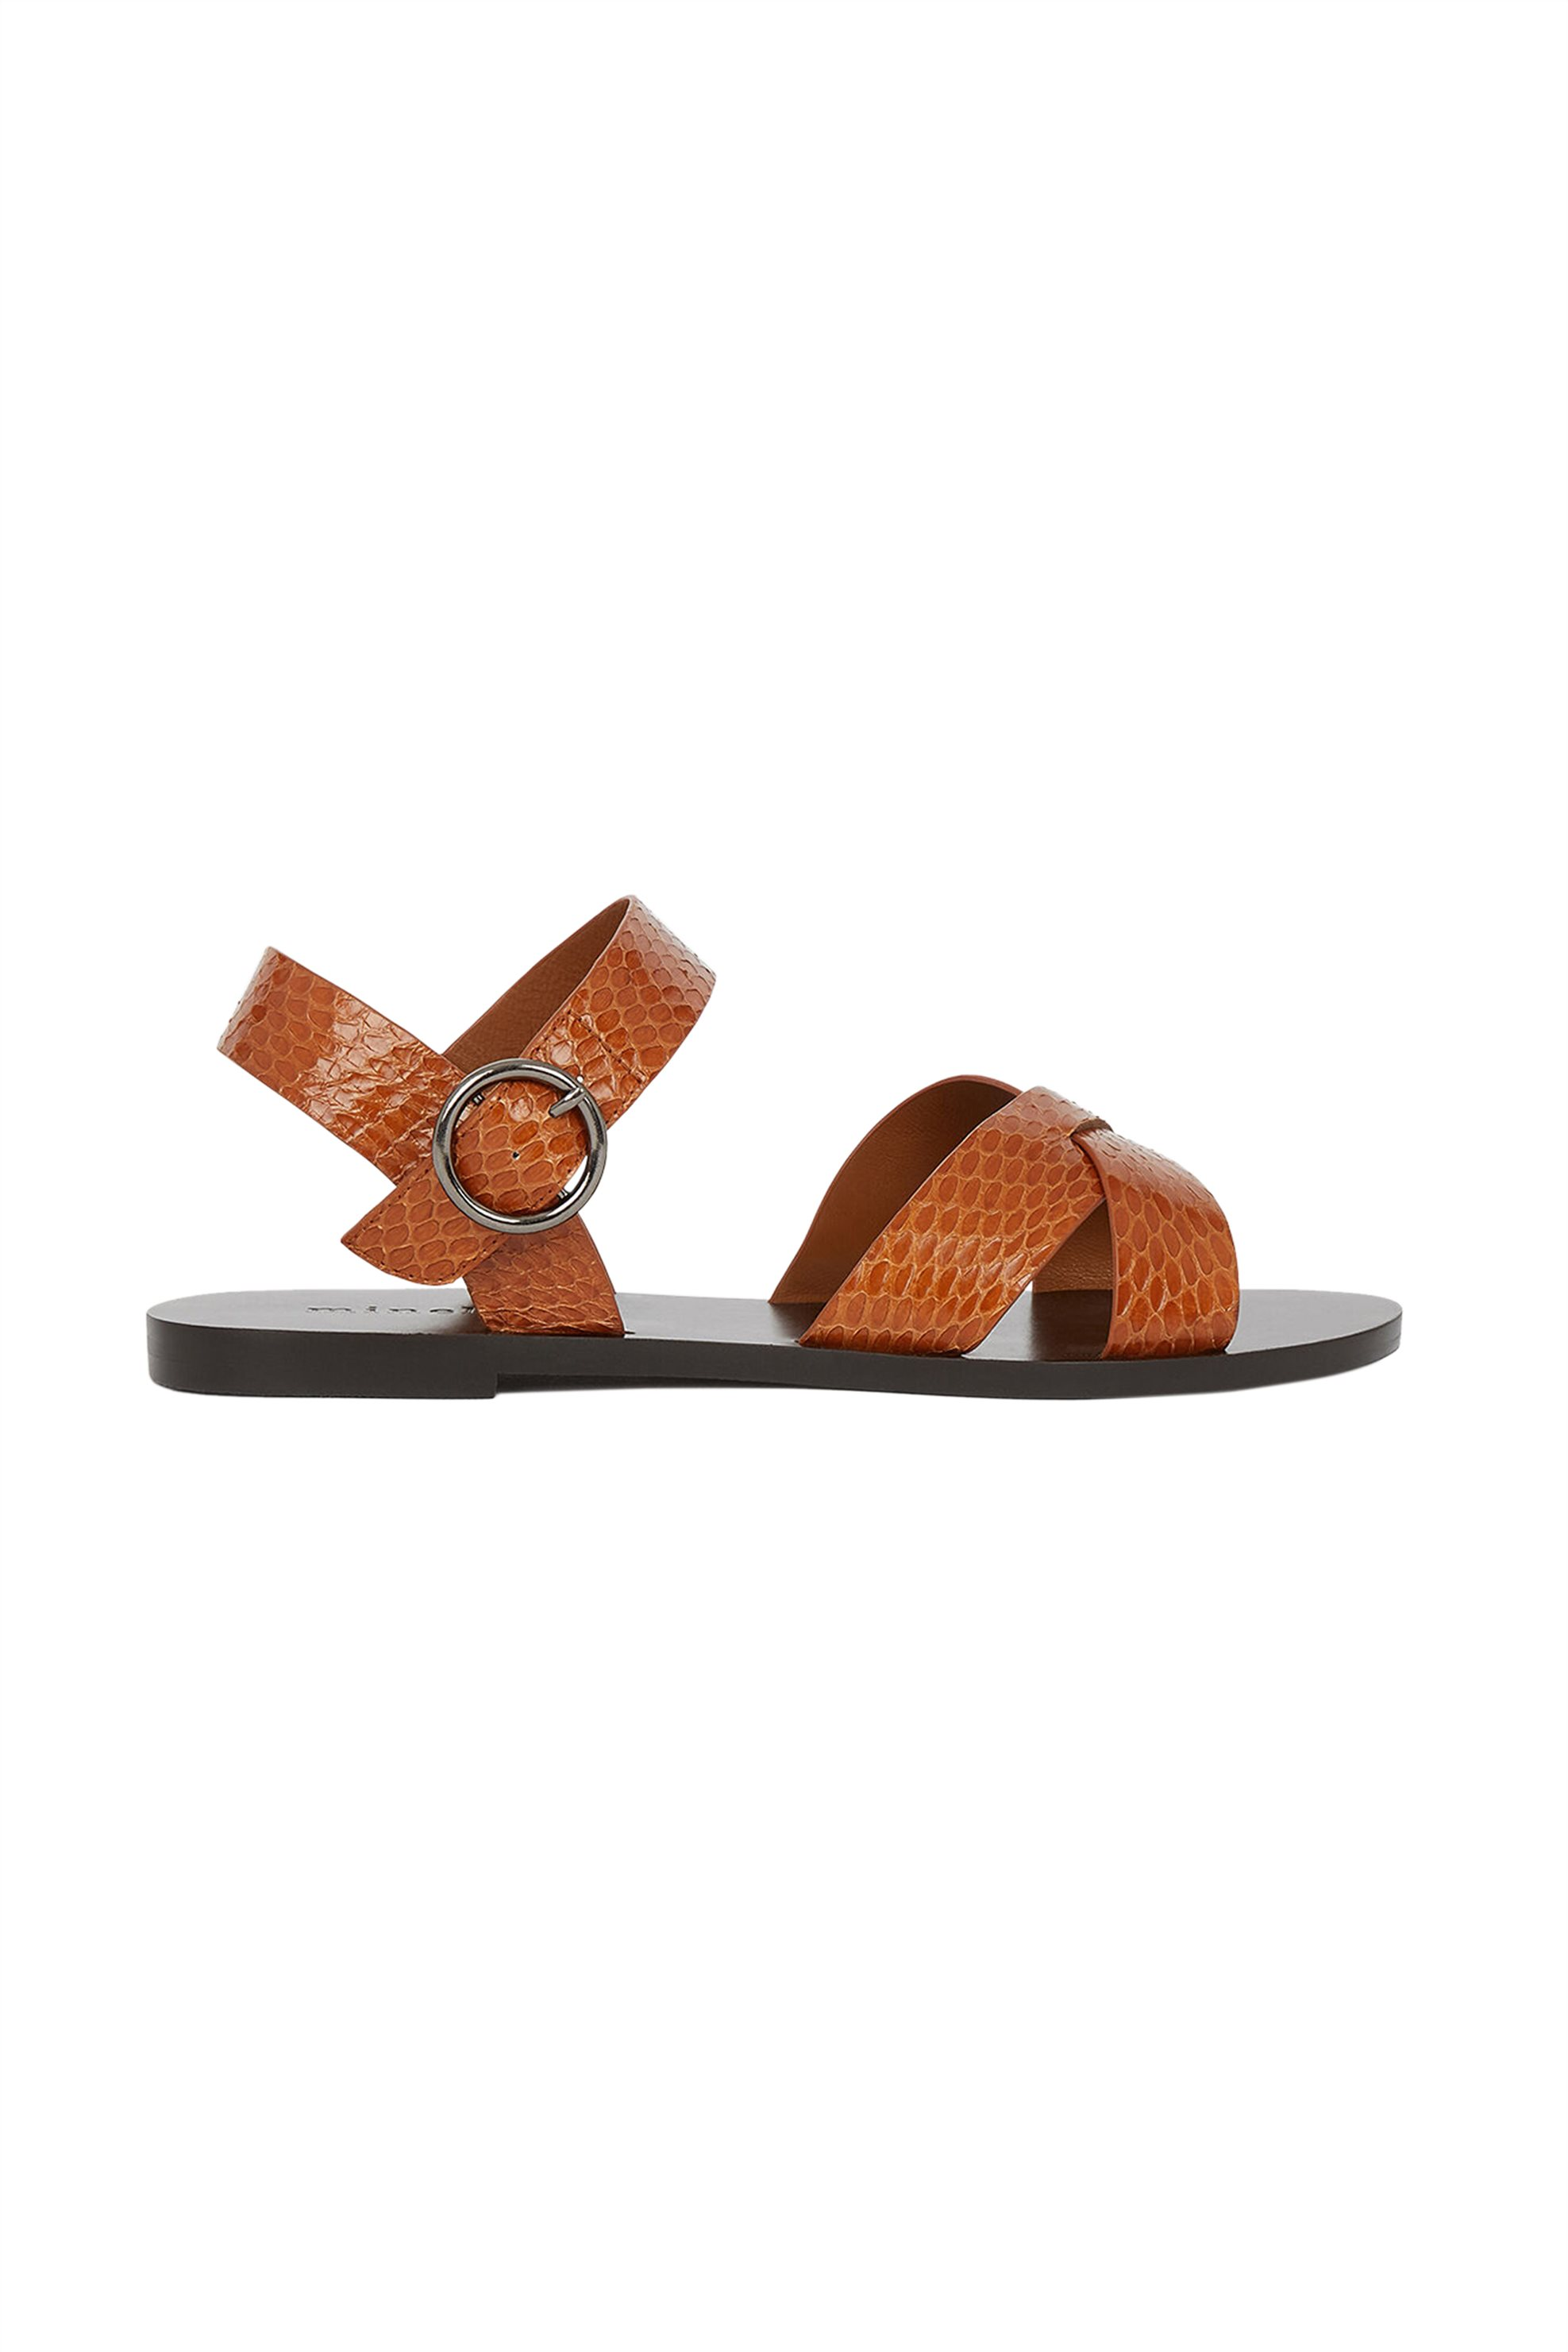 Minelli γυναικεία σανδάλια με crossover straps ''Naemi'' - 835784 - Ταμπά